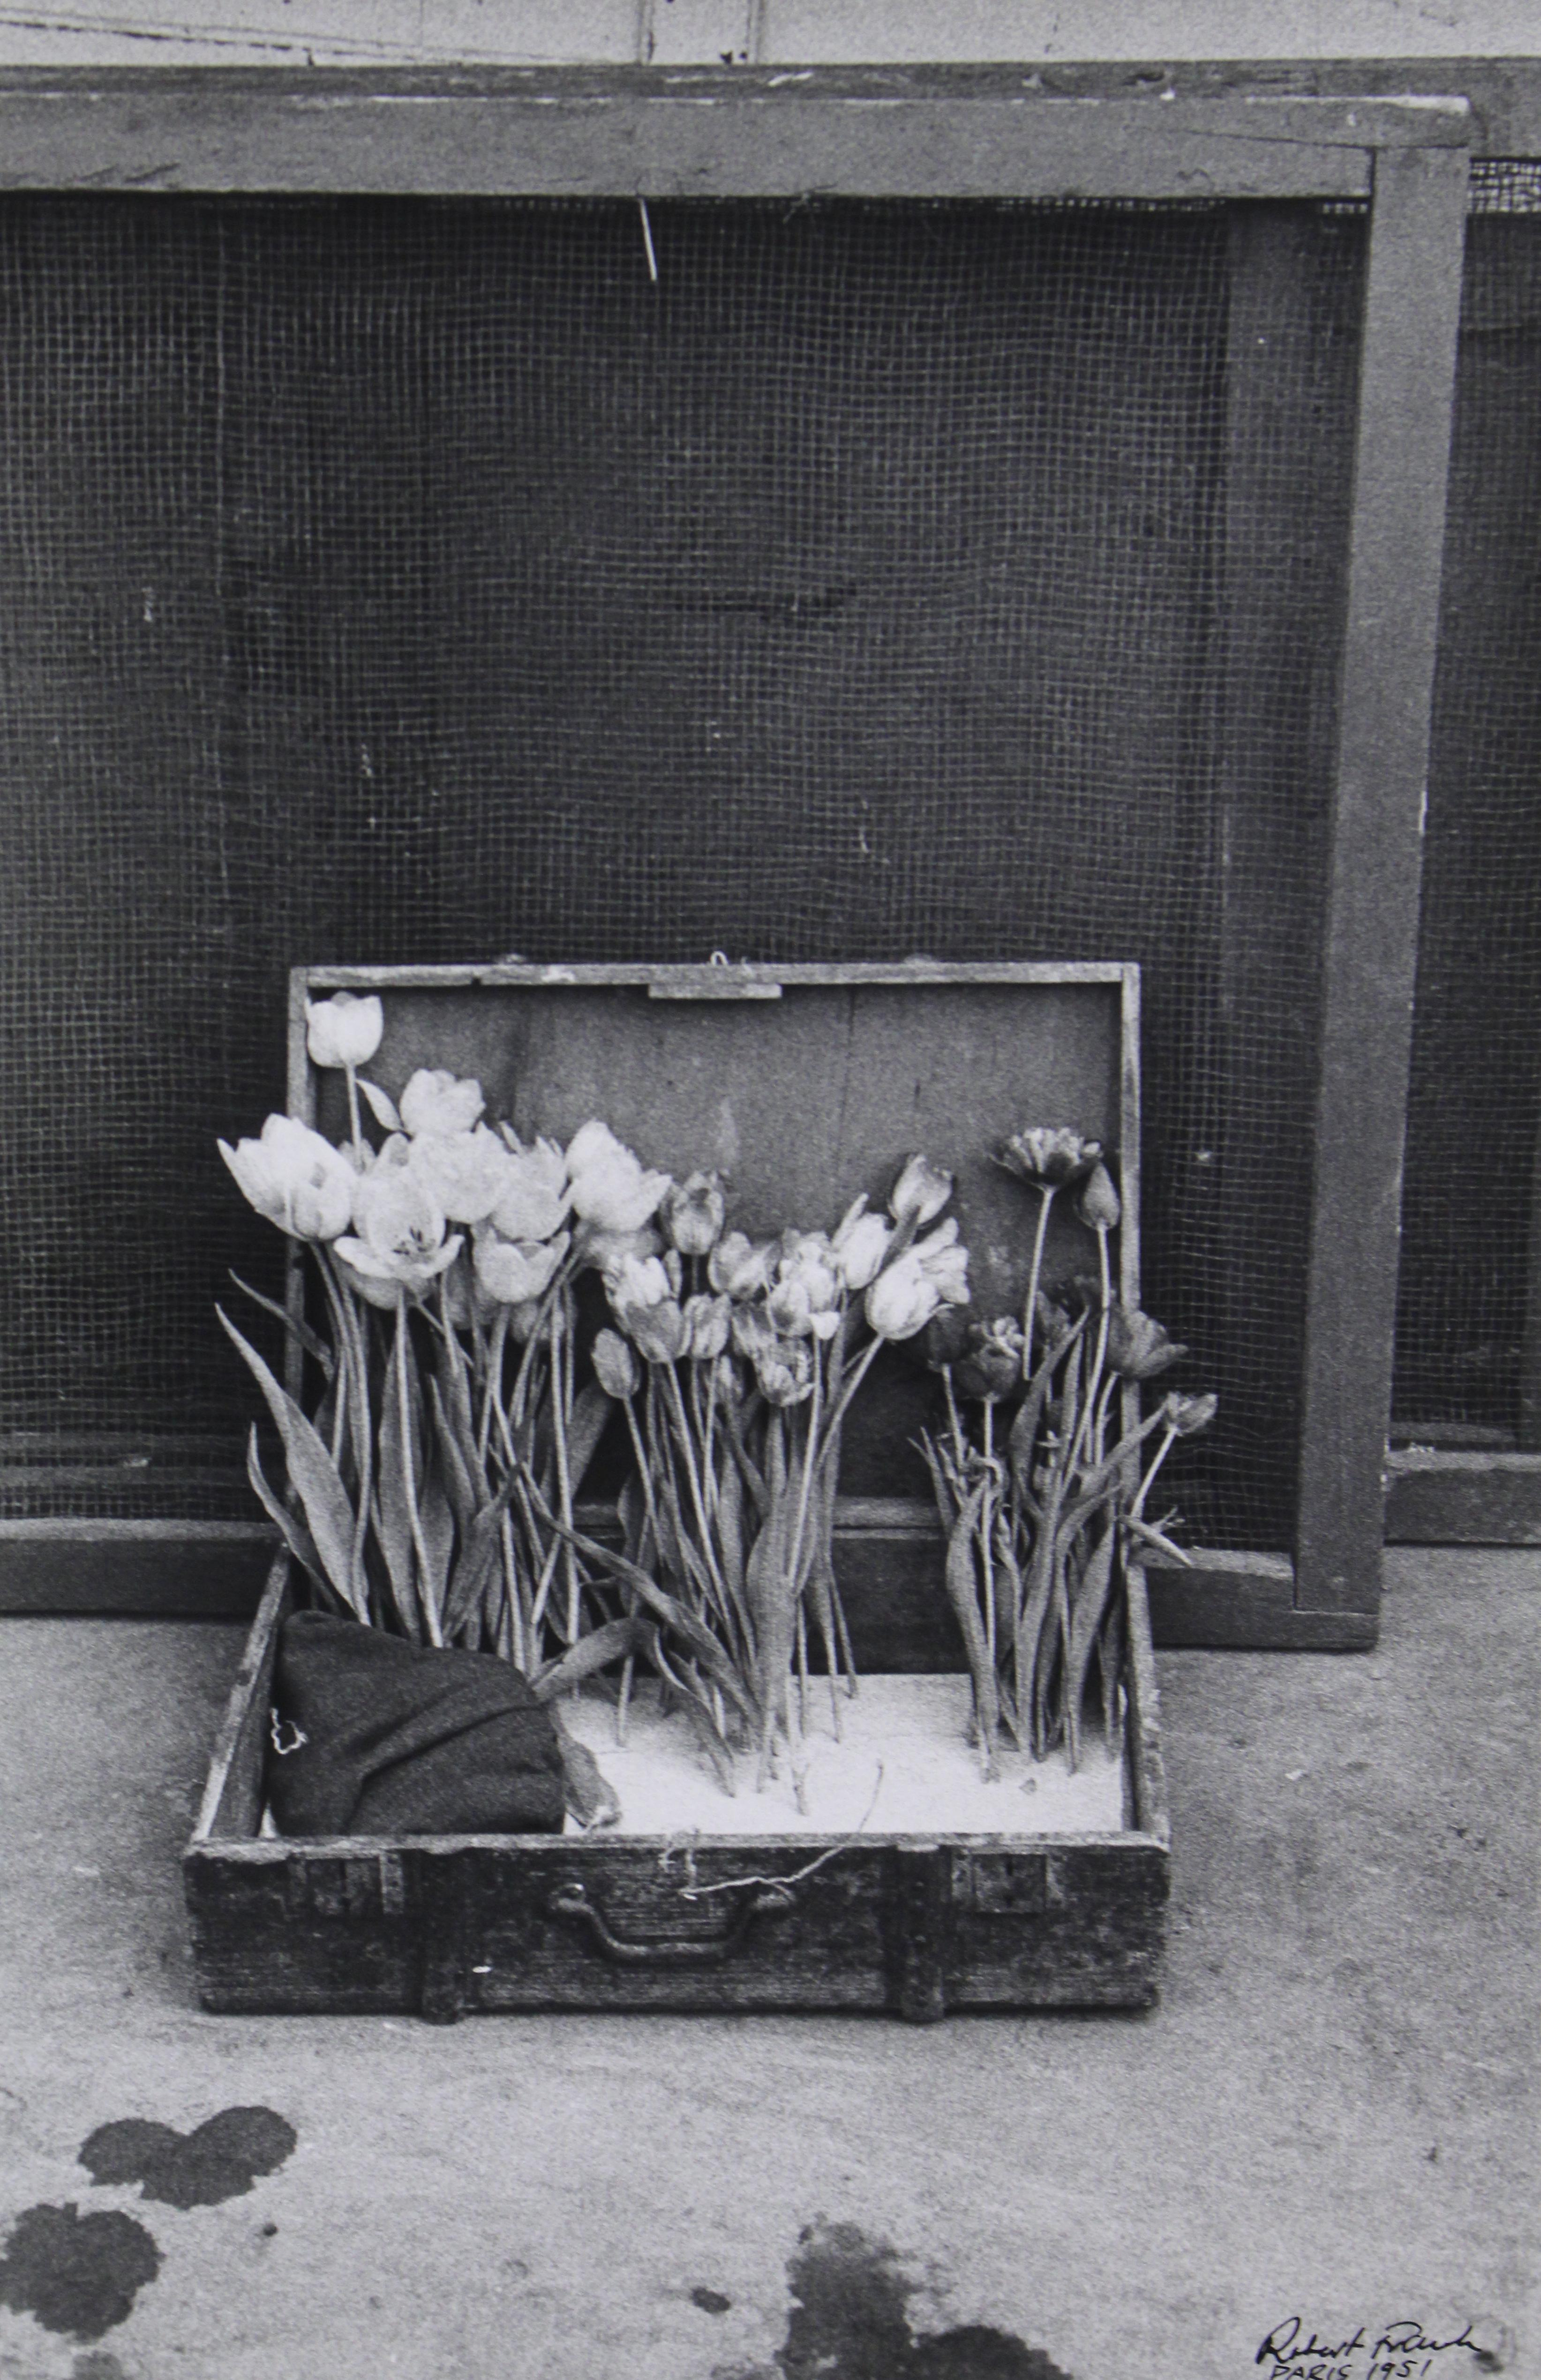 Paris - Robert Frank (Black and White Photography)